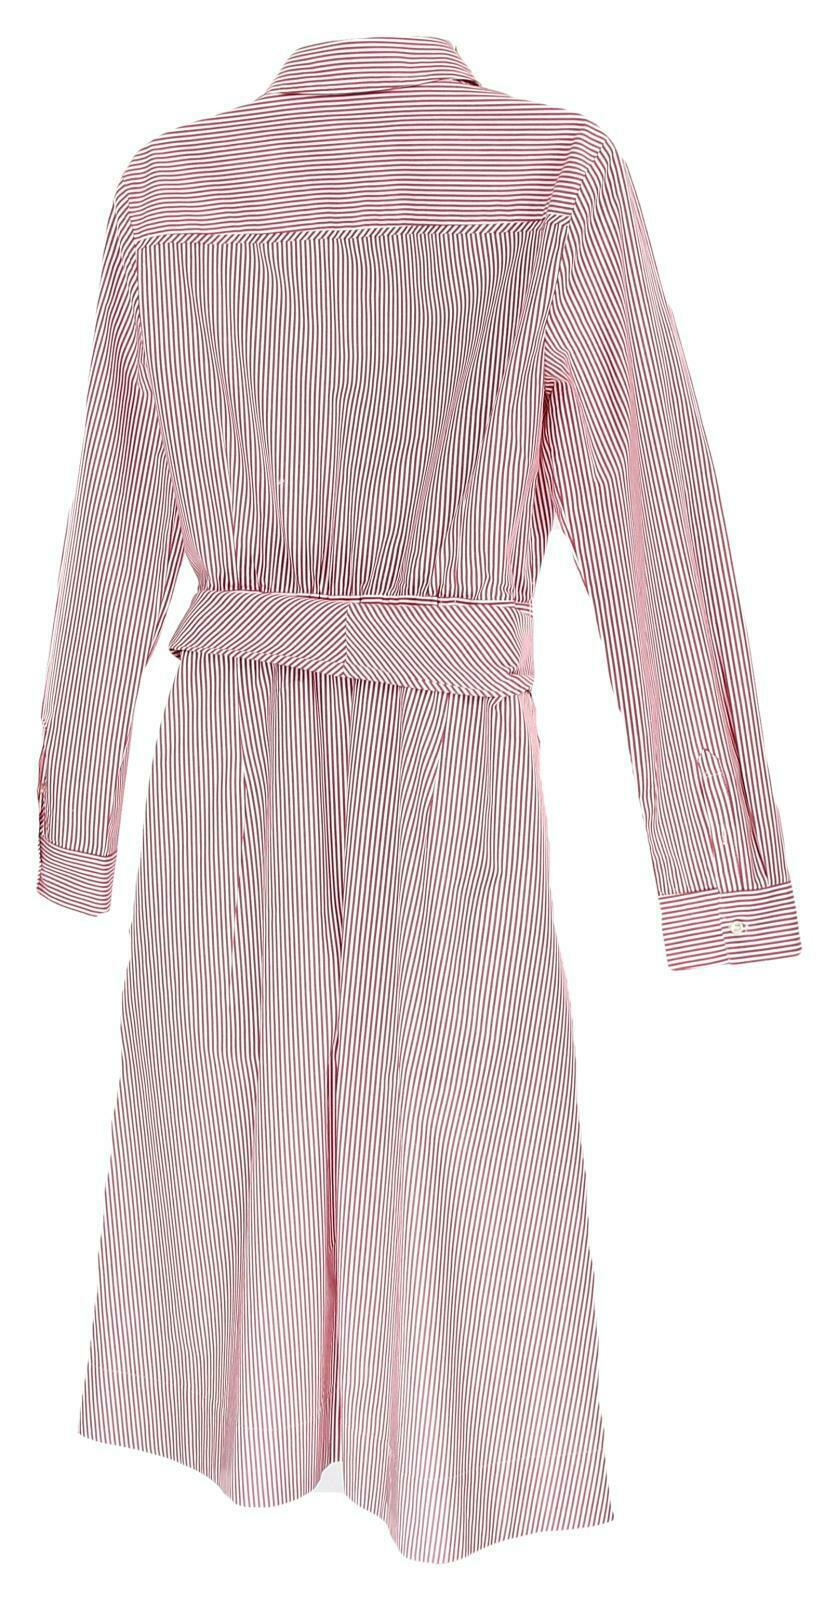 JCrew Womens Tie Waist Shirt Dress Red White Stripes Button Front Dress 14 H7791 image 6